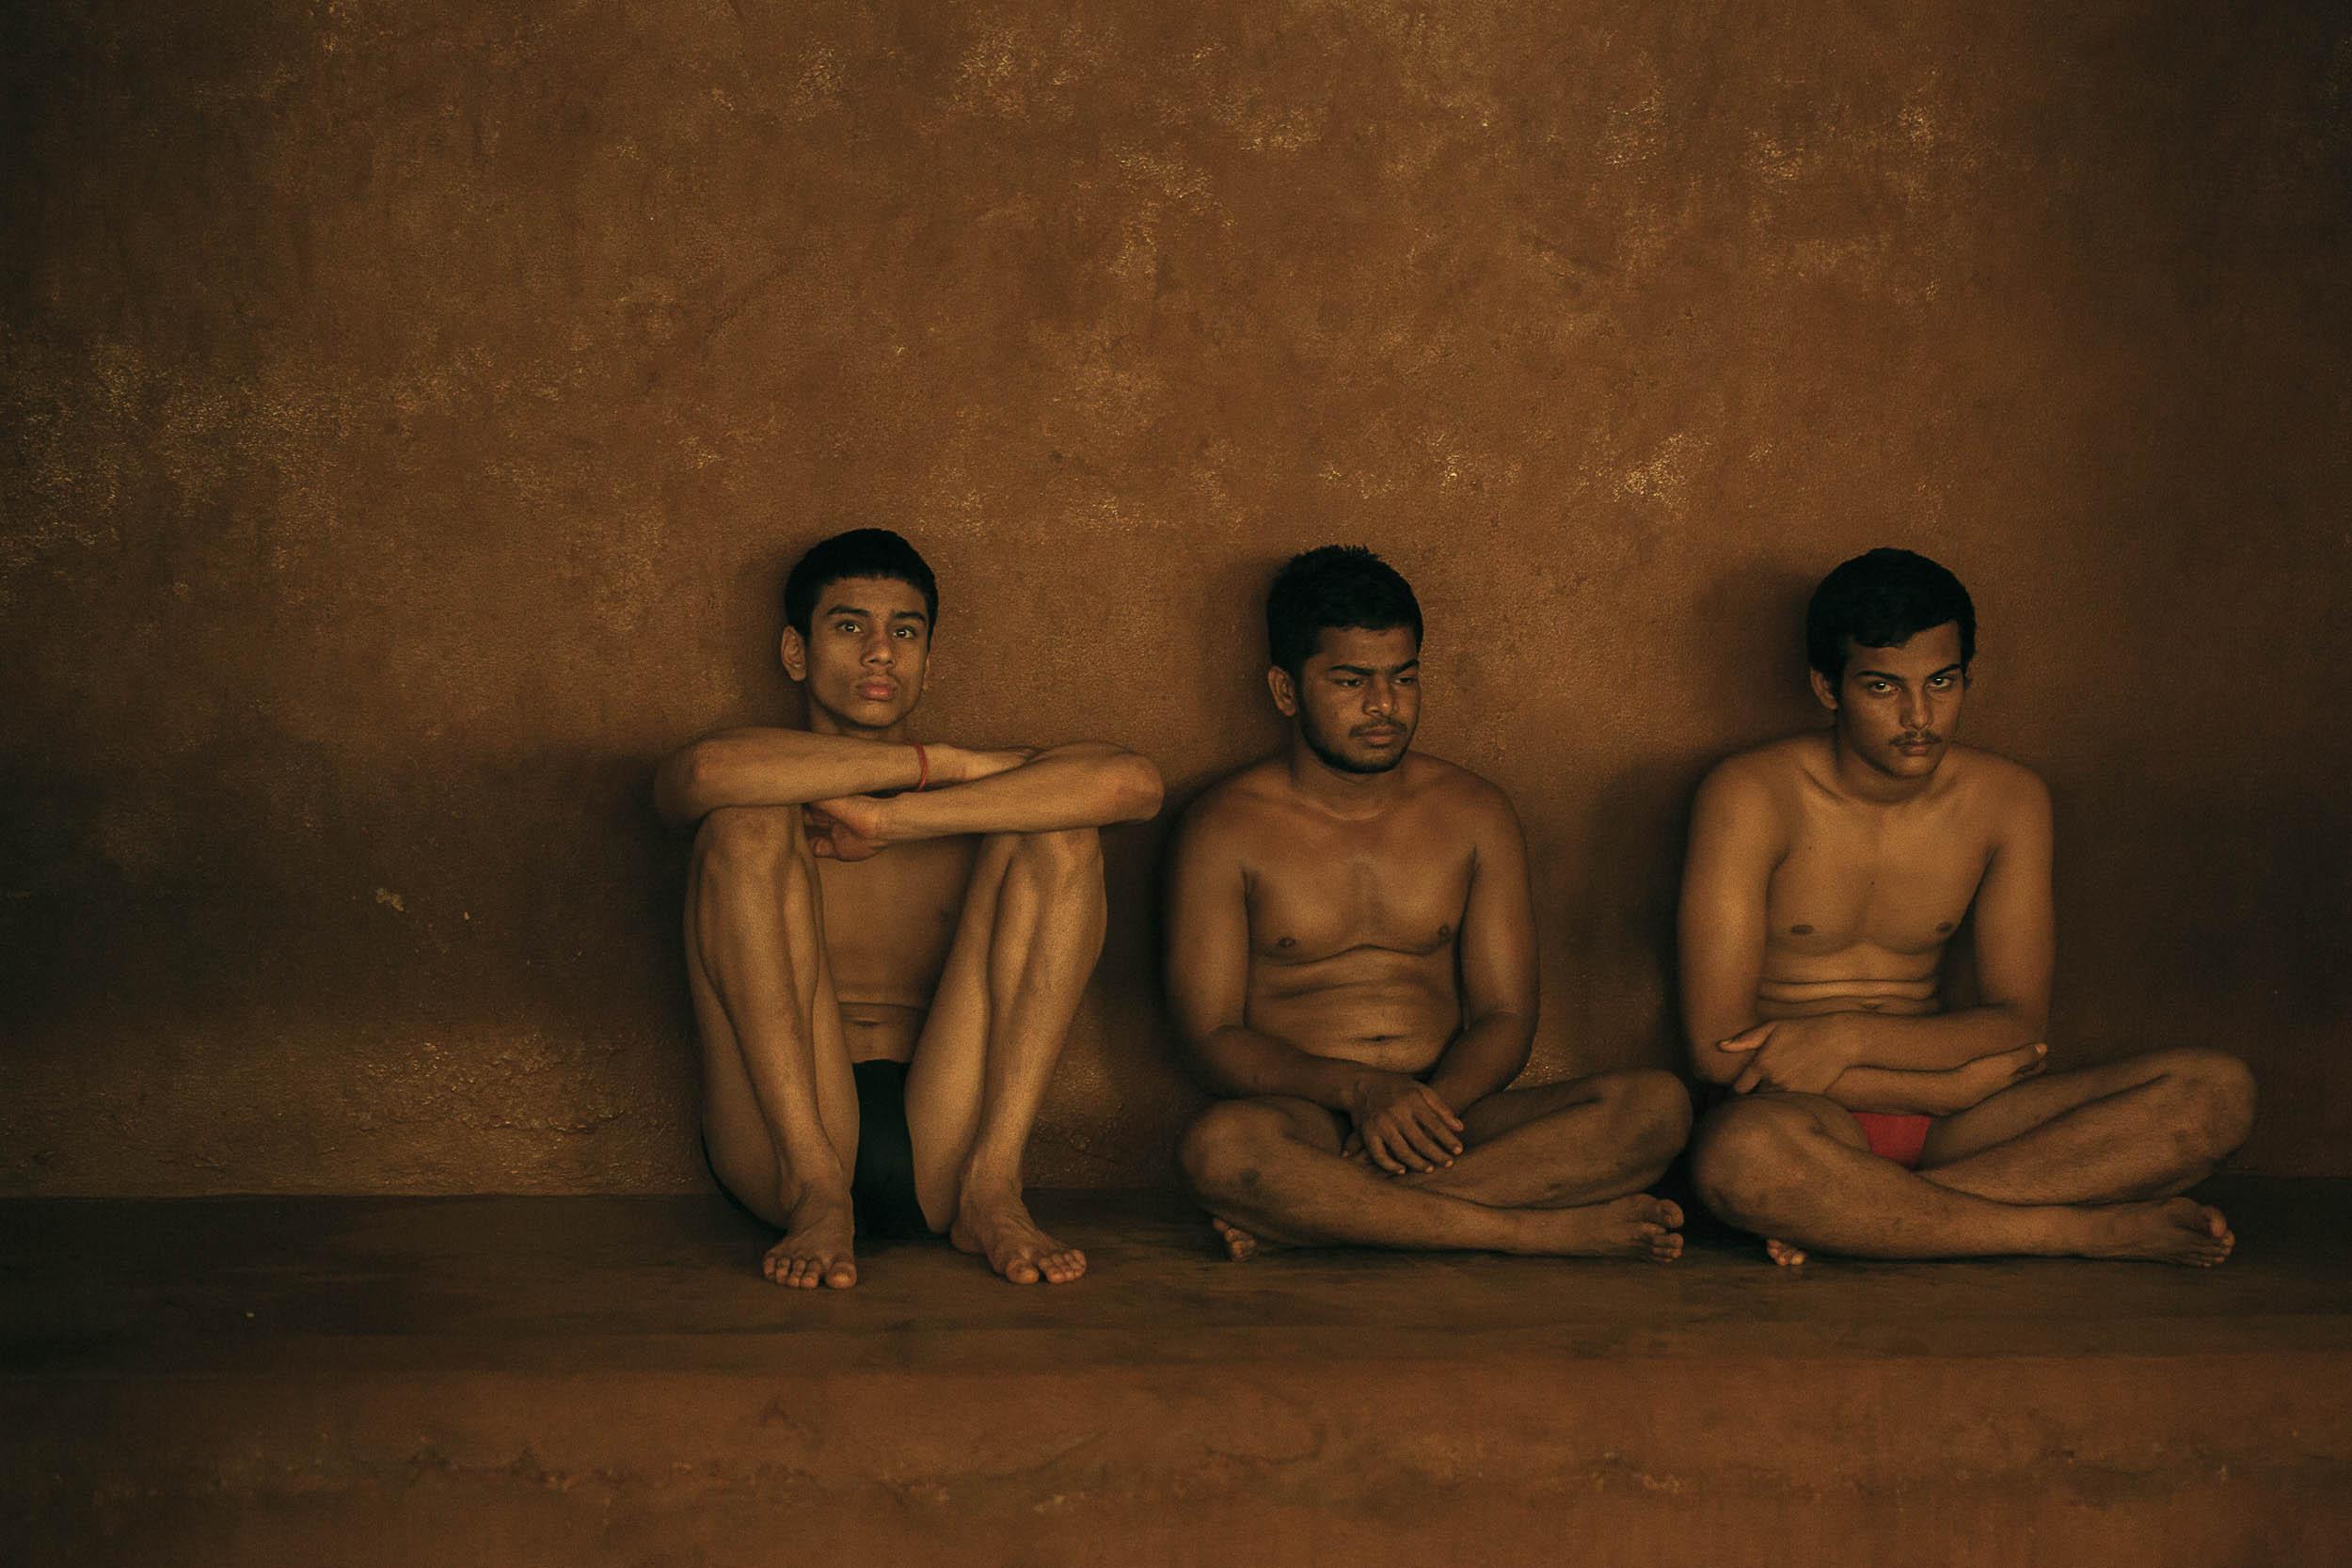 Sindhur_Photography_Travel_People_Wrestlers-22.JPG